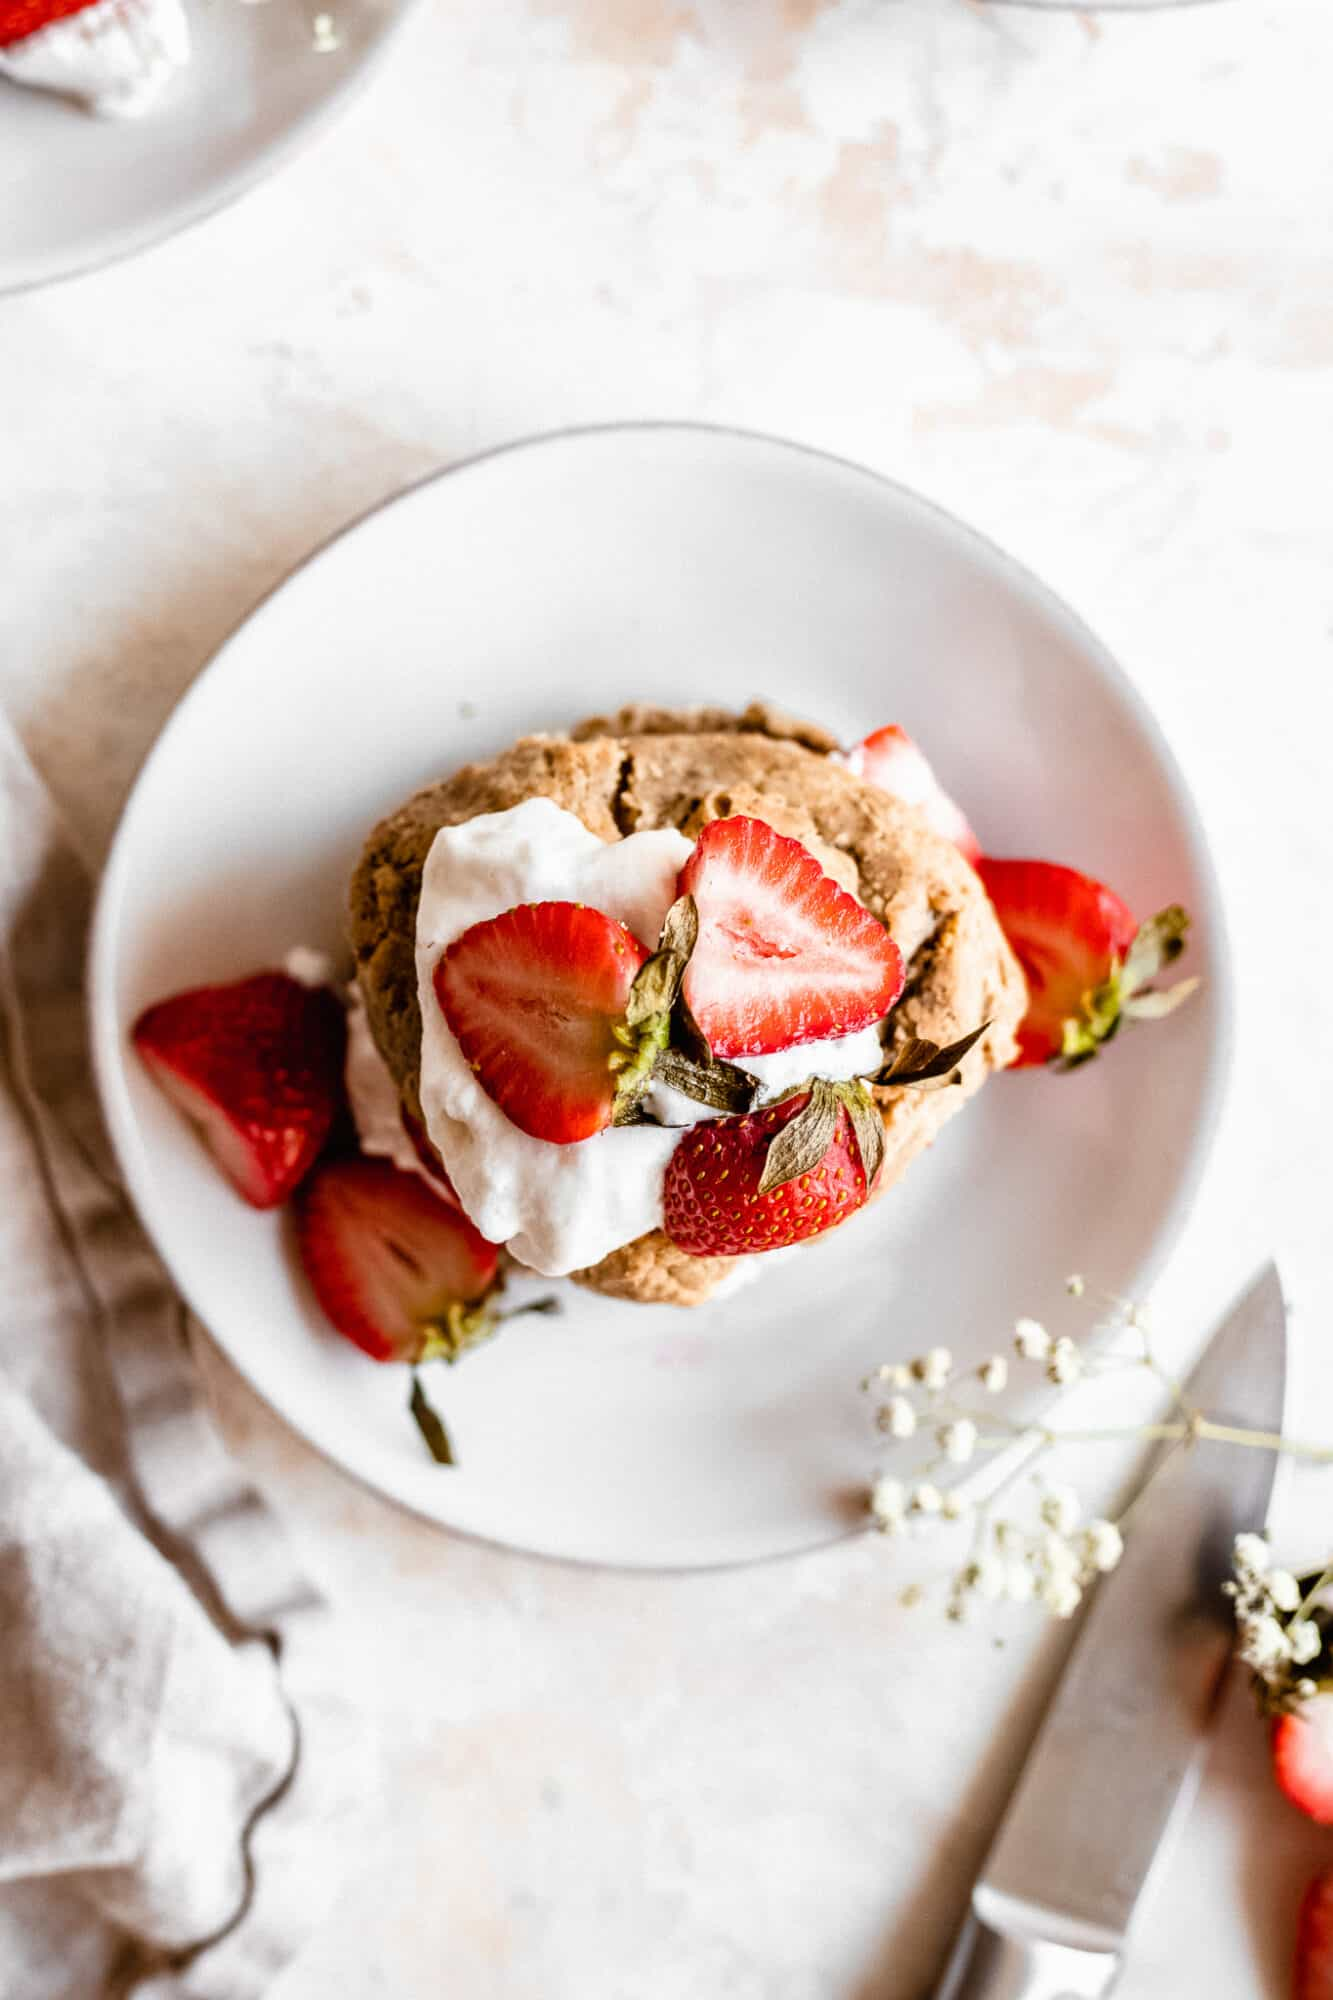 plate of strawberry shortcake